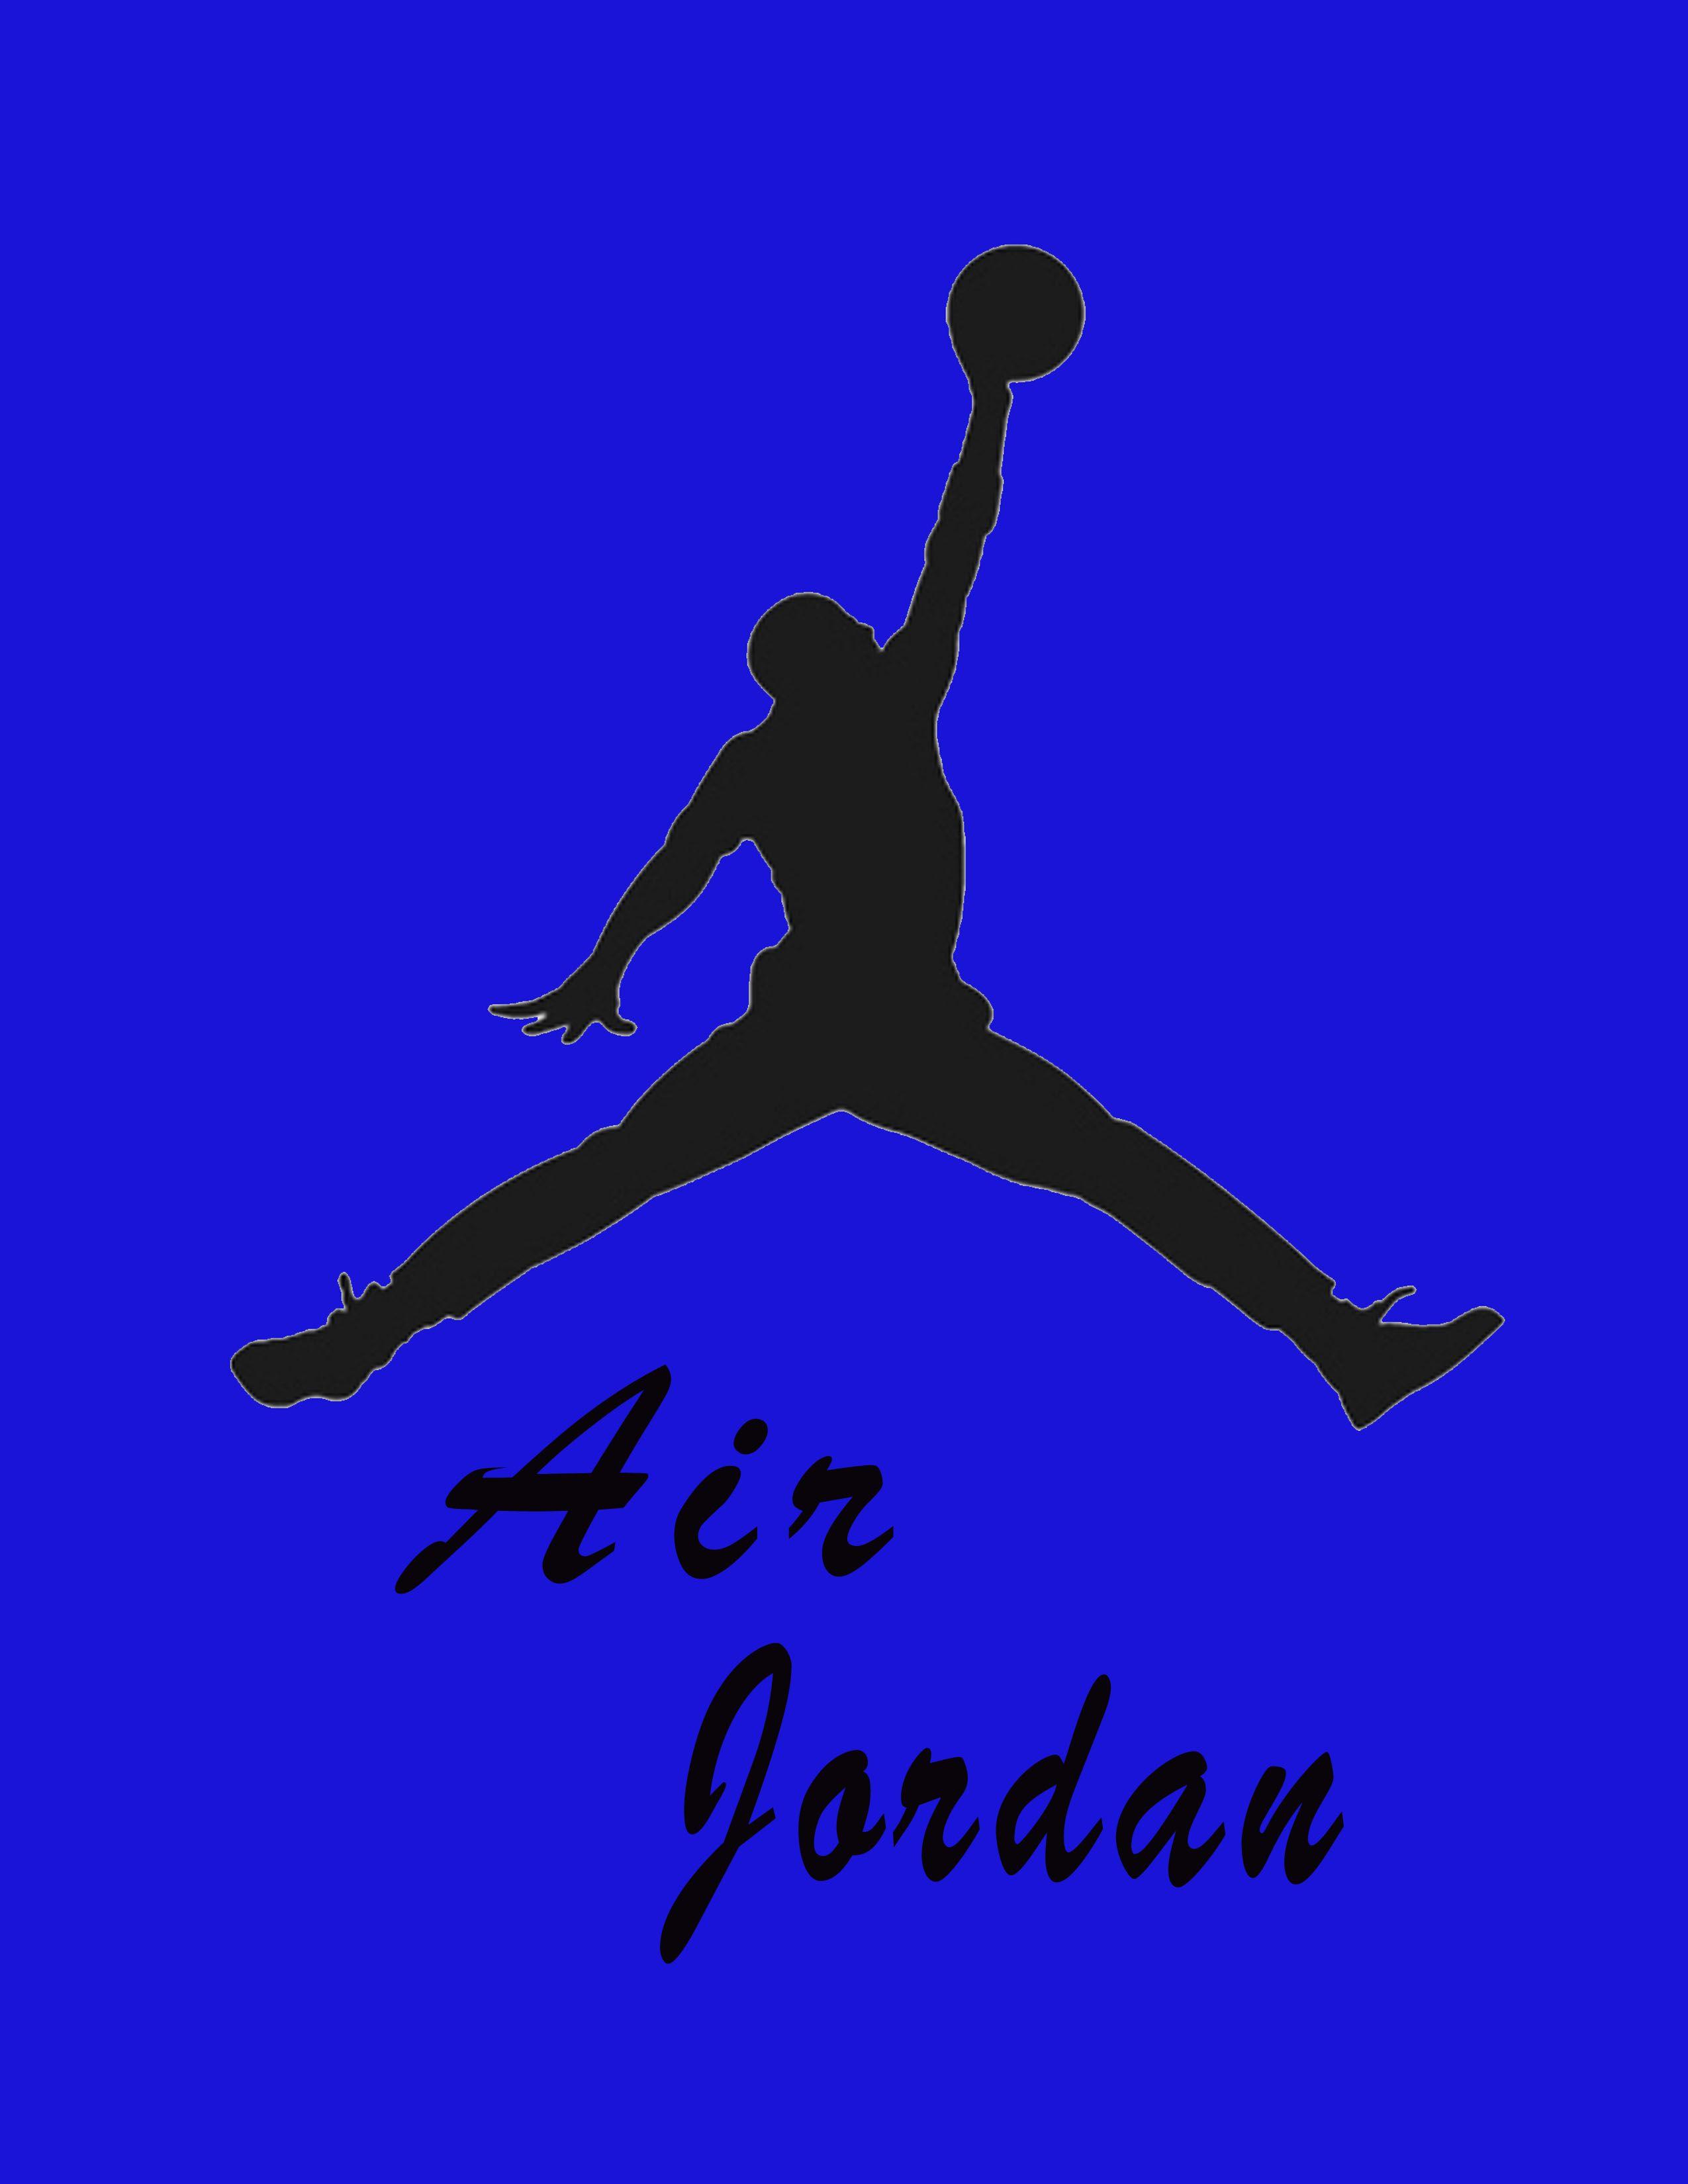 Air jordan logo Jordan logo wallpaper, Jordan logo